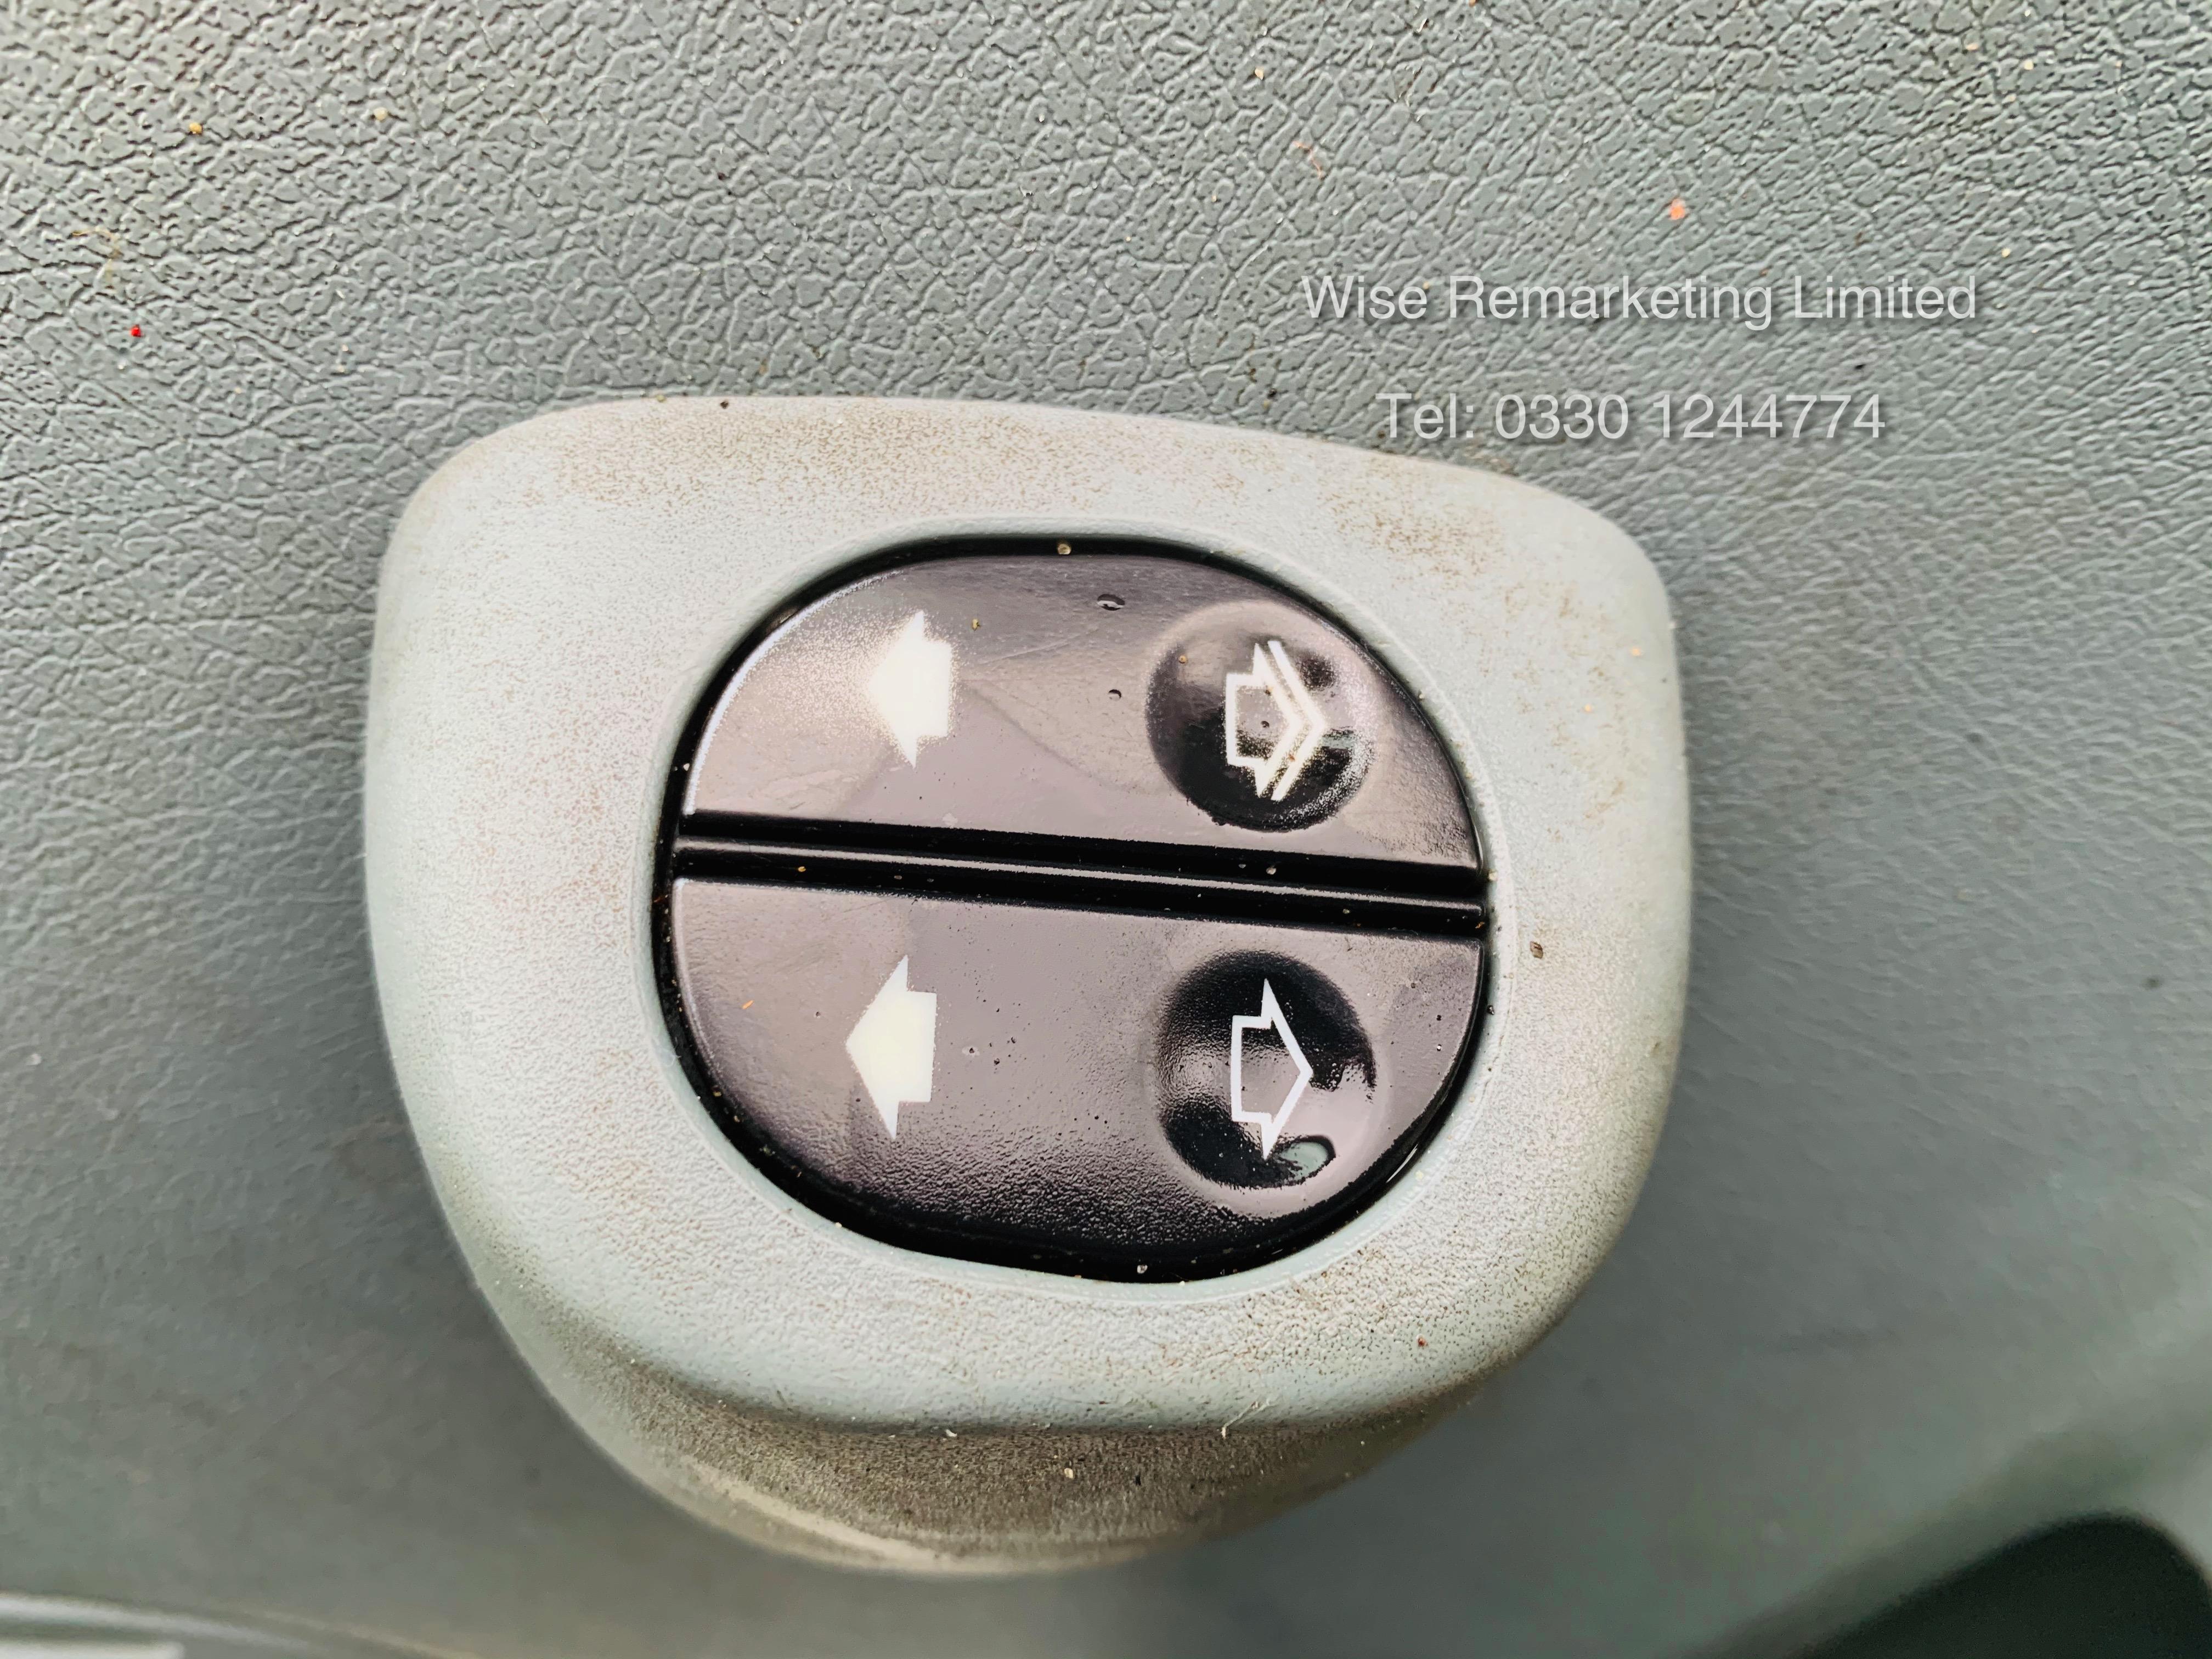 (RESERVE MET) Ford Transit T280 2.2 TDCI Dualliner Crew Van (6 Seater) - 2012 Model - 1 Year MOT - Image 12 of 15